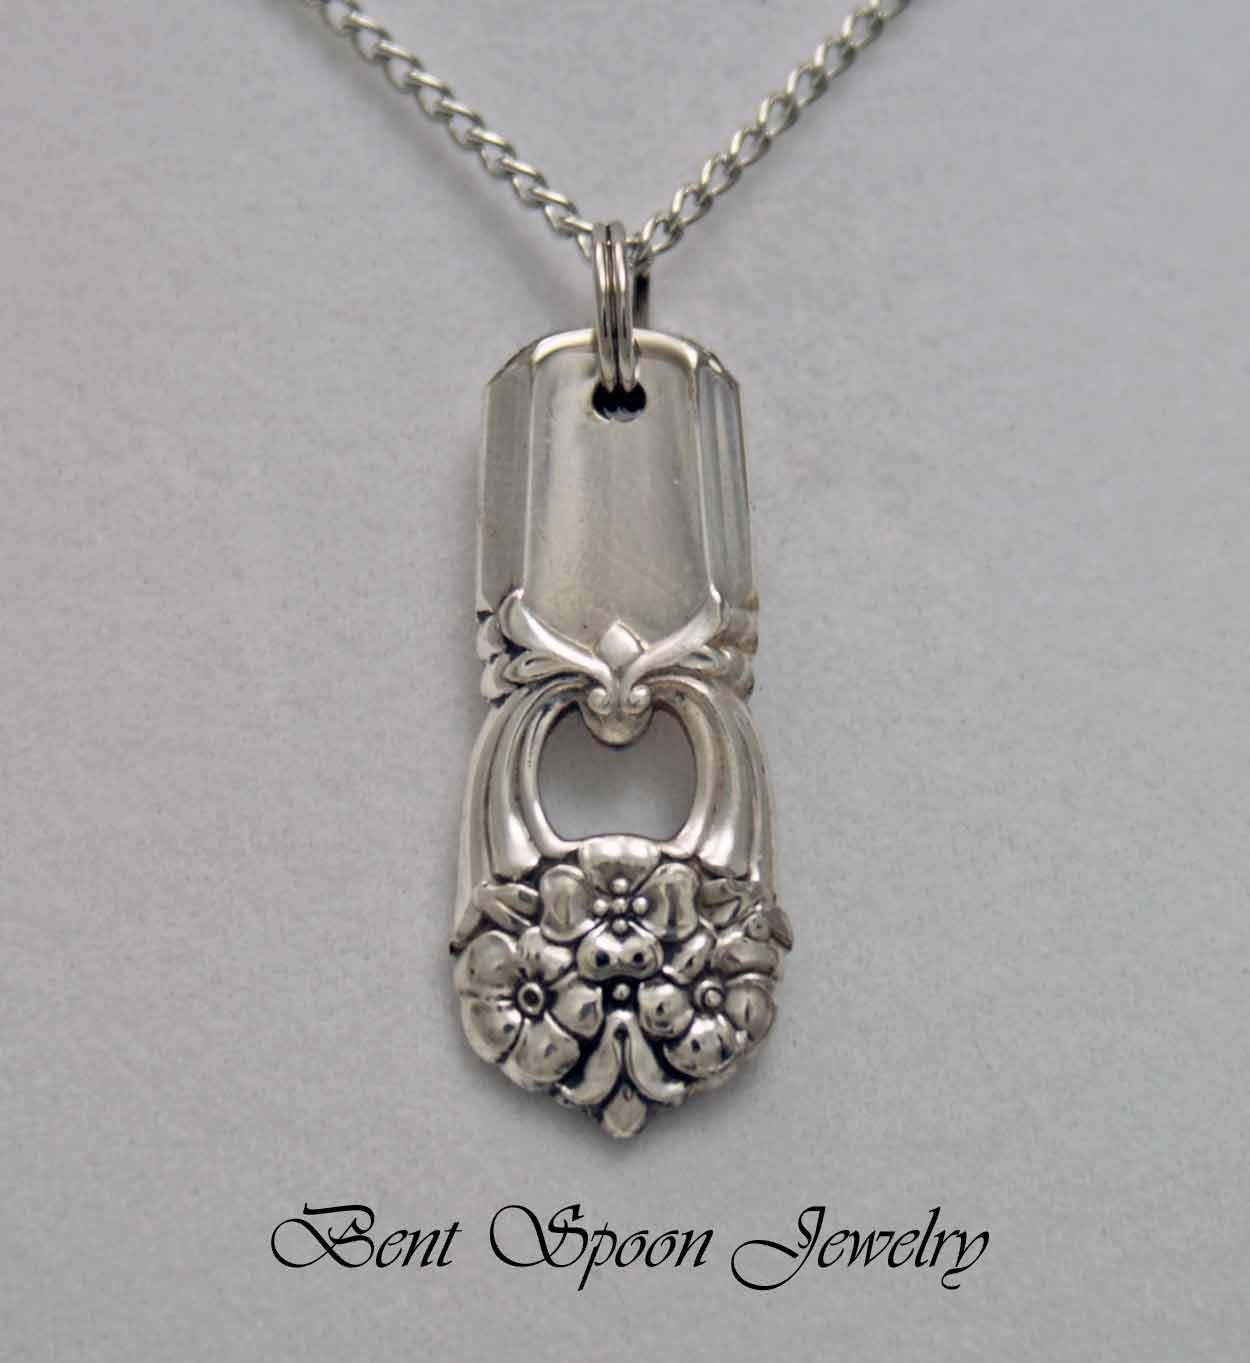 Spoon Jewelry Spoon NECKLACE Pendant Silverware Jewelry